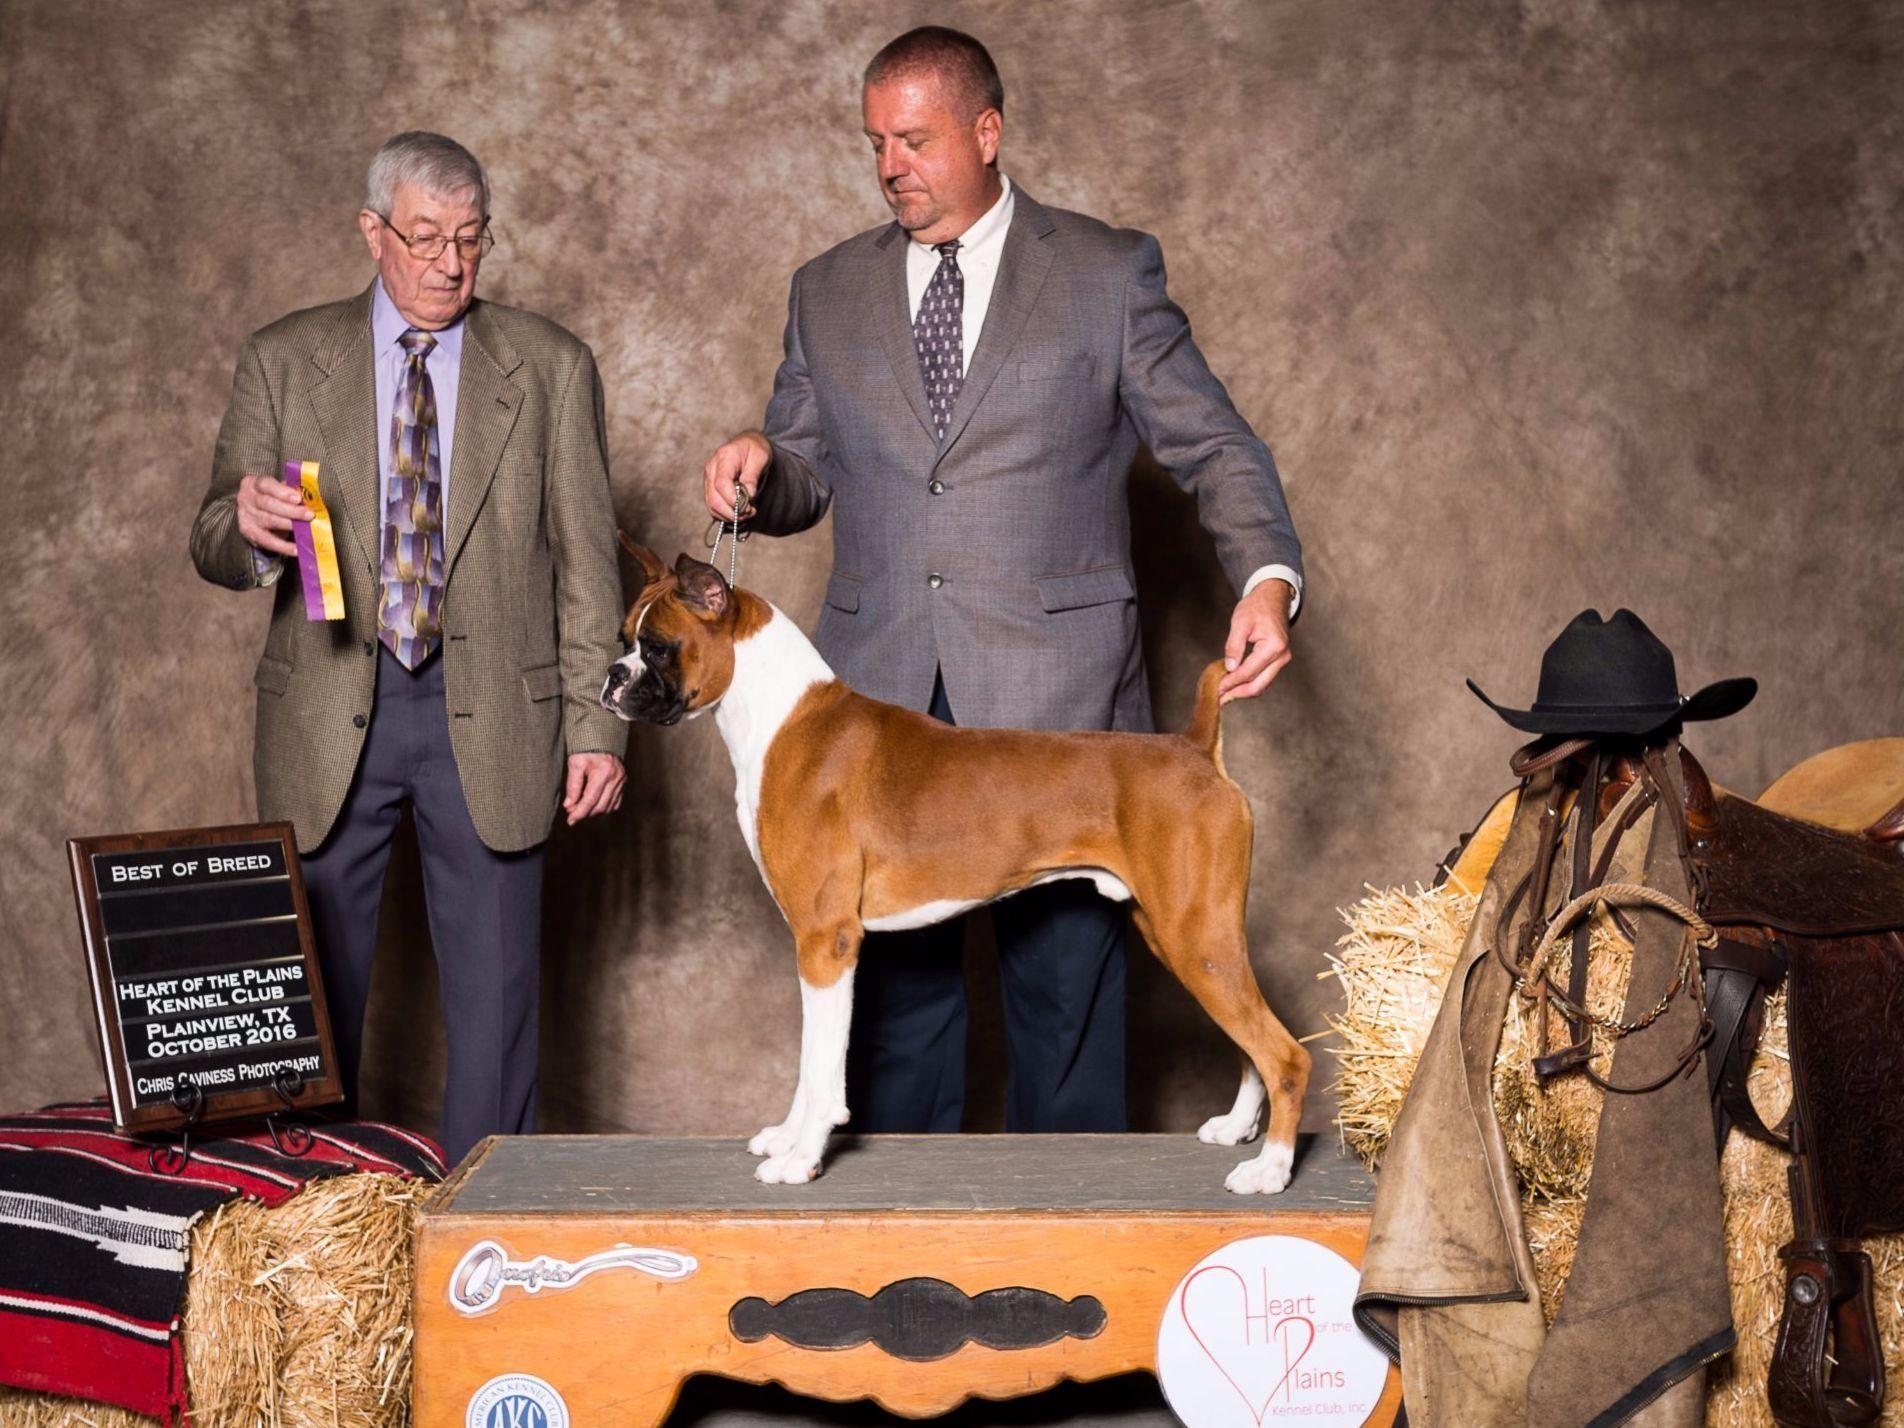 Besten Boxers Dean Brenner Has Puppies For Sale On Akc Puppyfinder Akc Puppies For Sale Canine